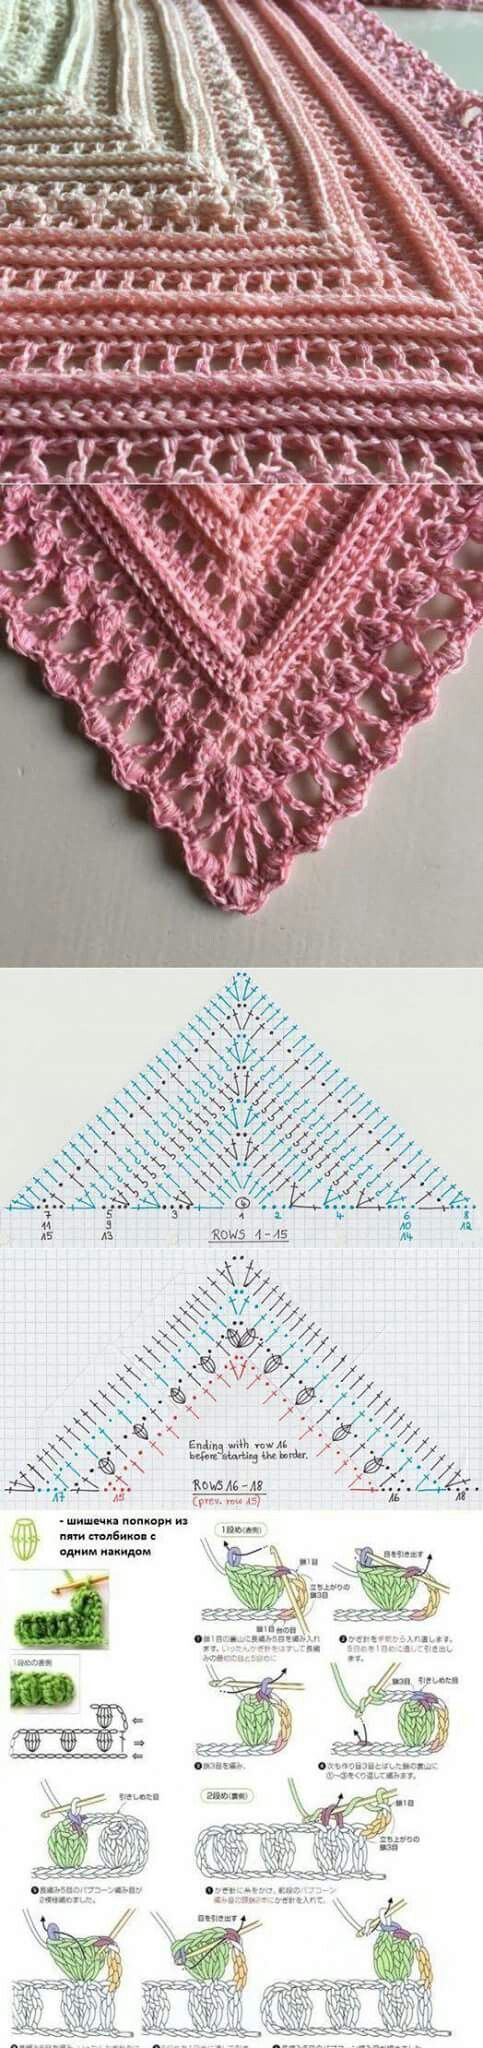 Pin de Nadja Krebs en Crochet Shawl | Pinterest | Chal, Ponchos y ...